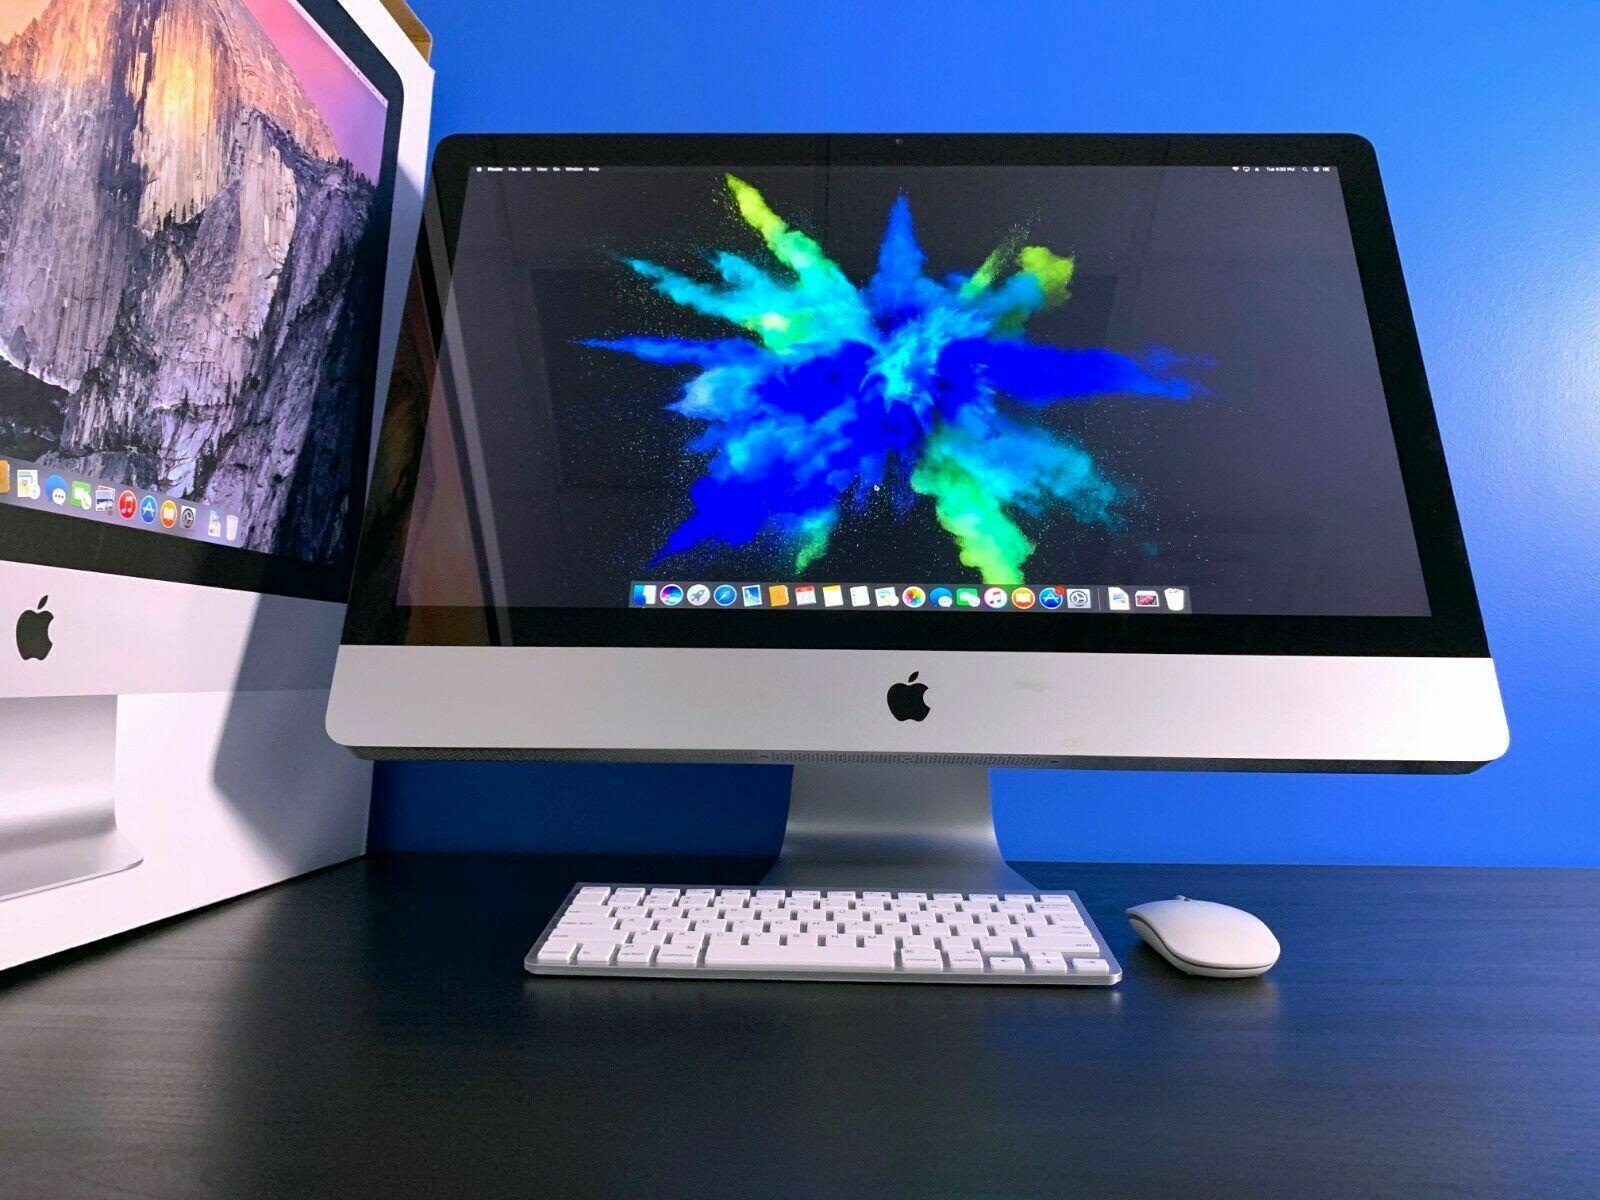 Apple iMac 27 Desktop All-In-One | 3.7GHZ TURBO | 1TB | OS2017 | 3 YEAR WARRANTY. Buy it now for 699.00